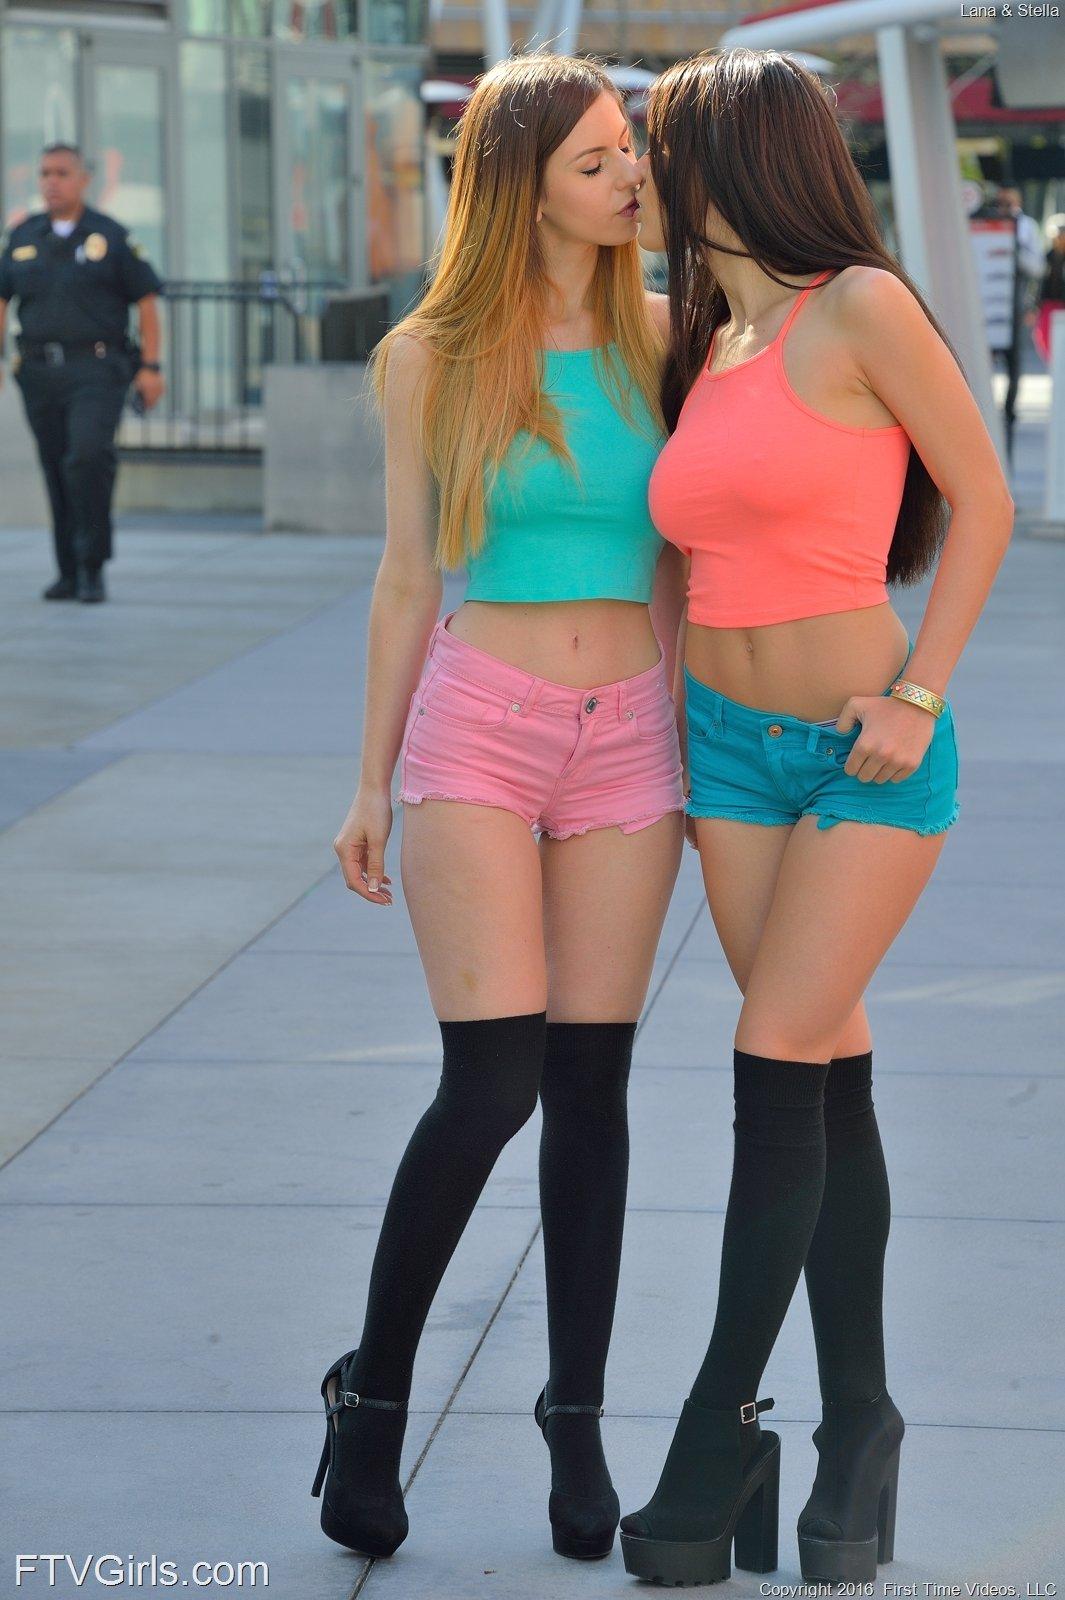 lana-stella-public-lesbian-shorts-nude-ftvgirls-02